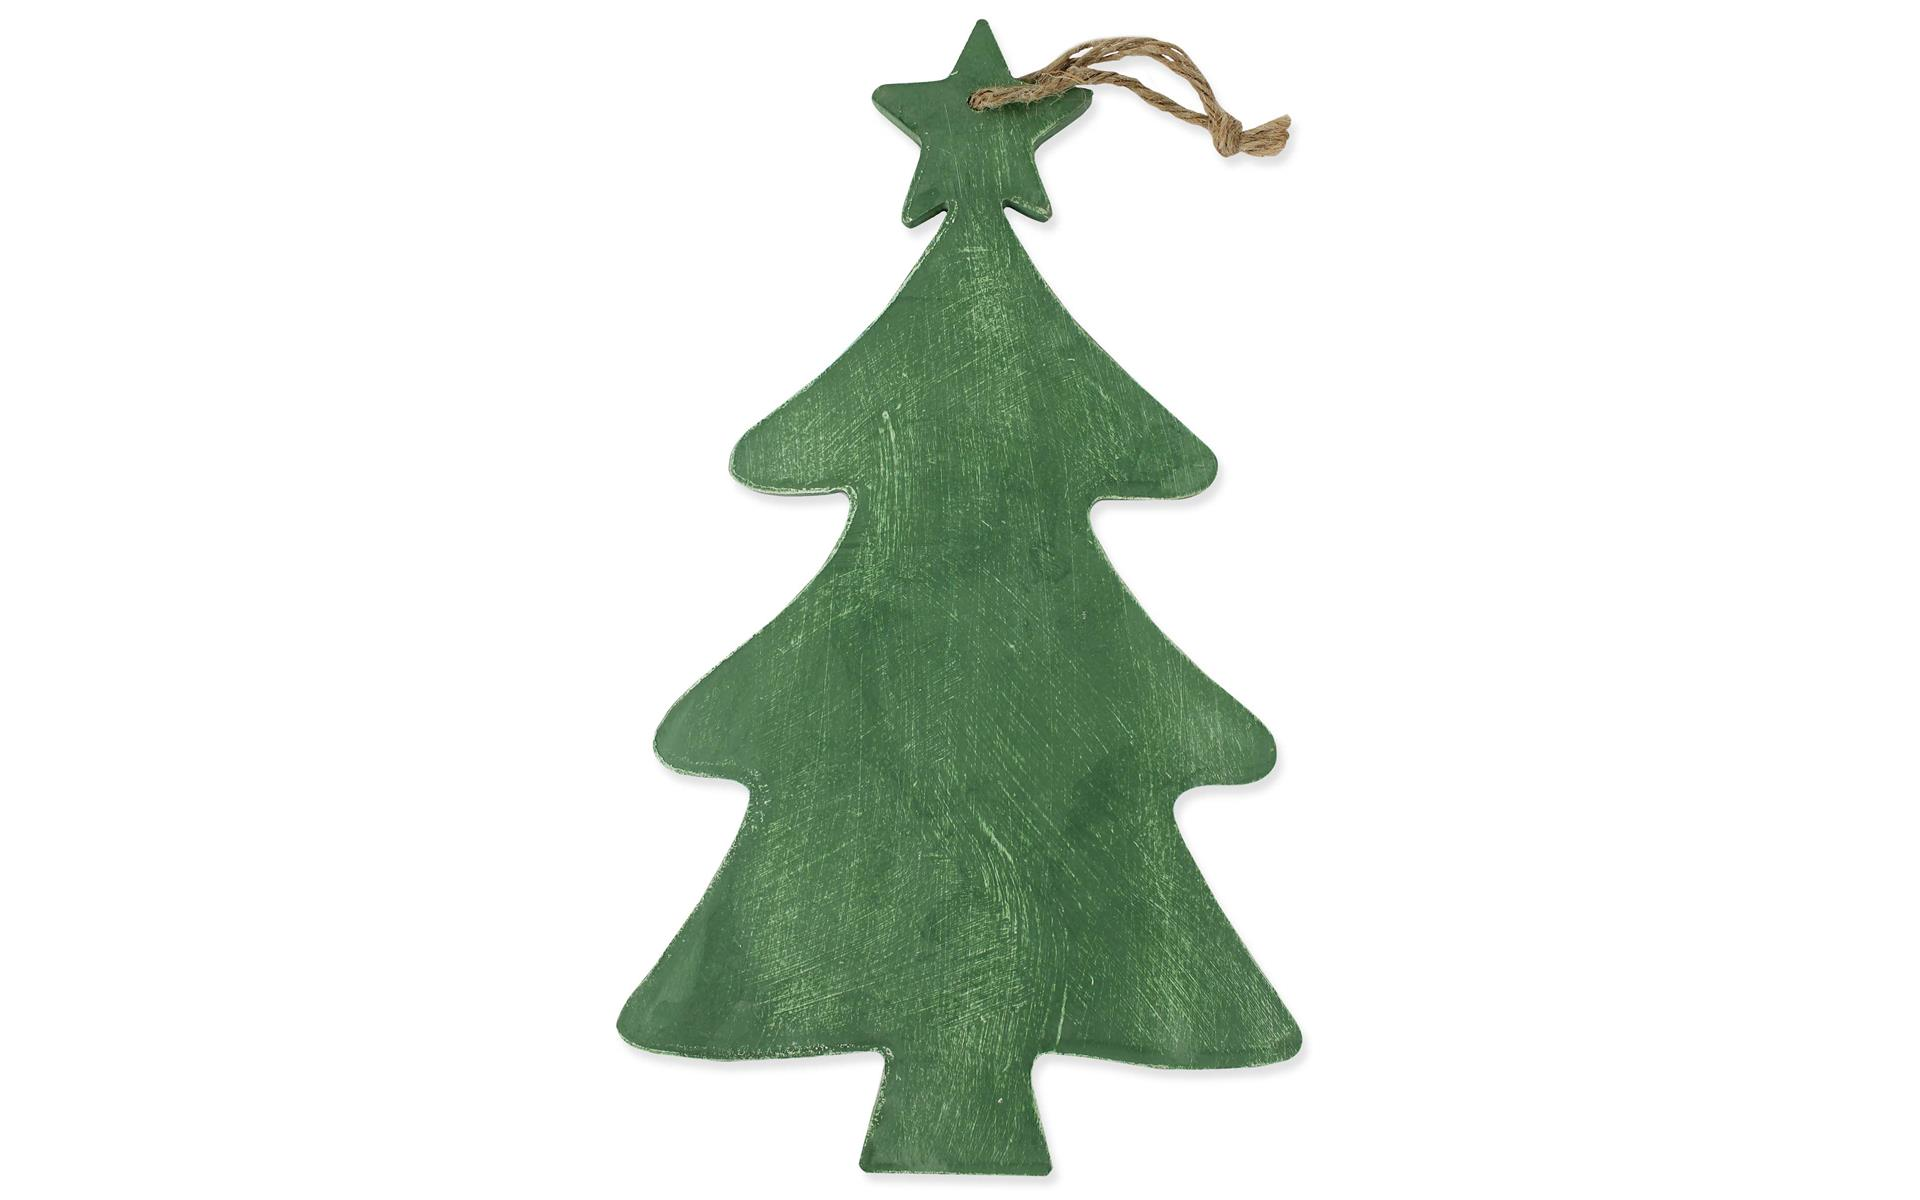 Fjl48 Spc Wood Christmas Tree W Star Hang 10 25x17 5 Grn Walmart Com Walmart Com